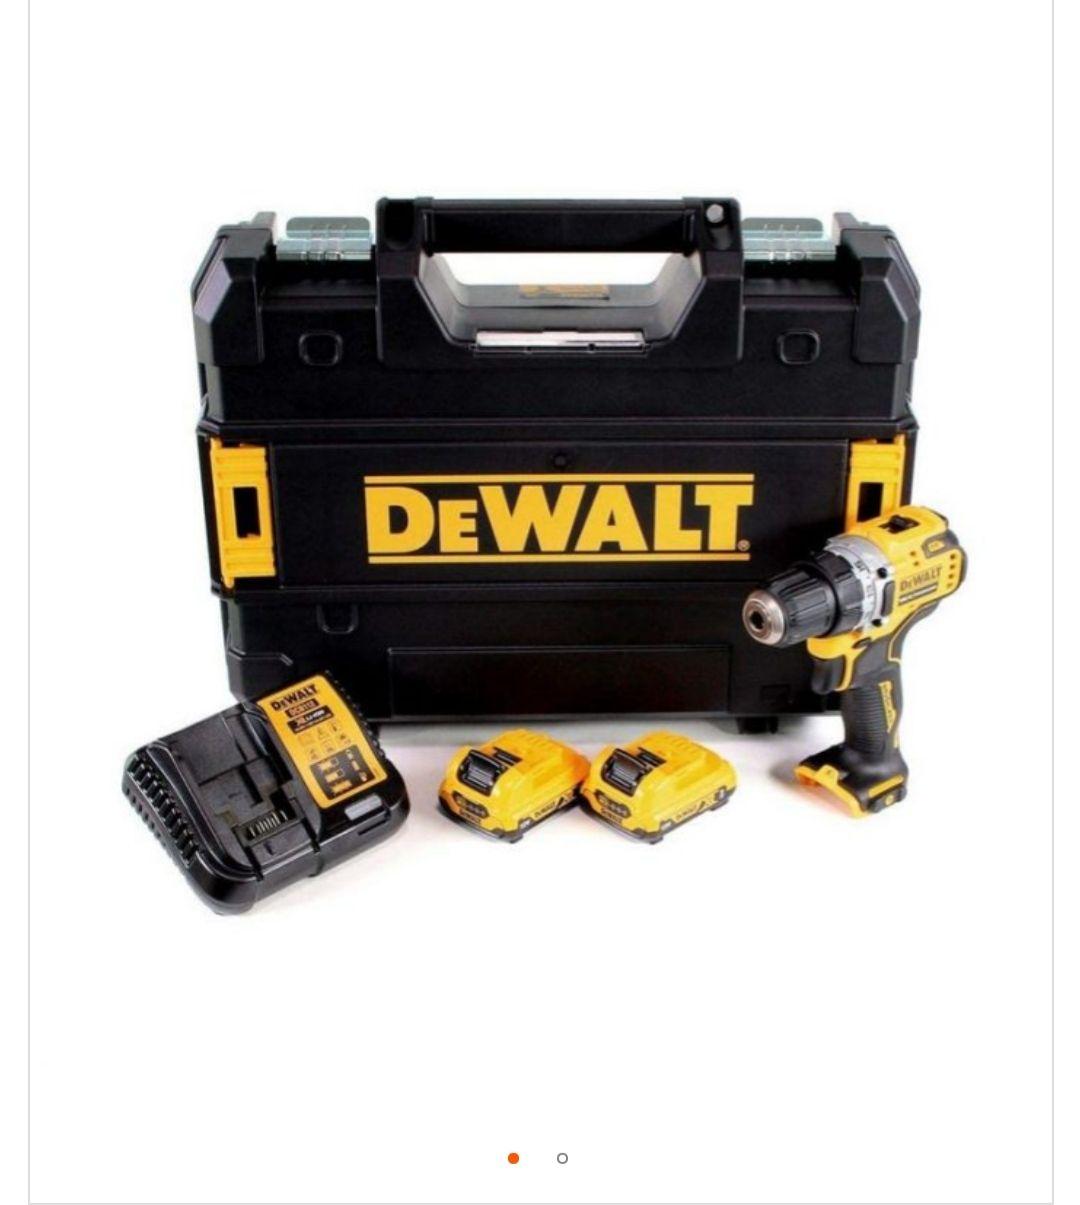 Perçeuse-visseuse Dewalt XR Brushless 12V + 2 batteries 2Ah Li-ion + chargeur + coffret TSTAK - DCD701D2